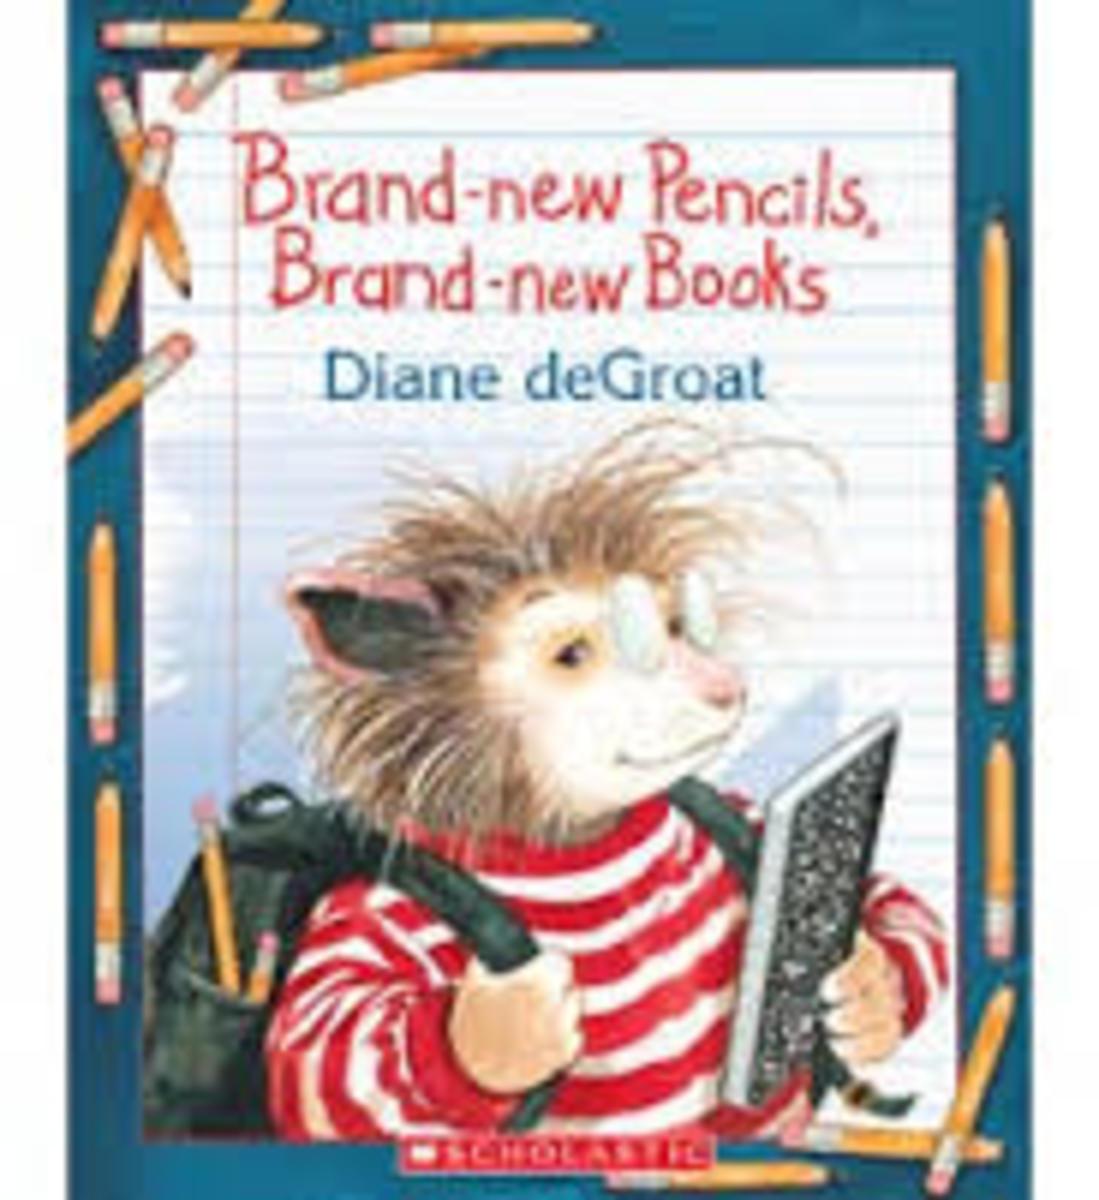 Back-to-School Book Club Picks